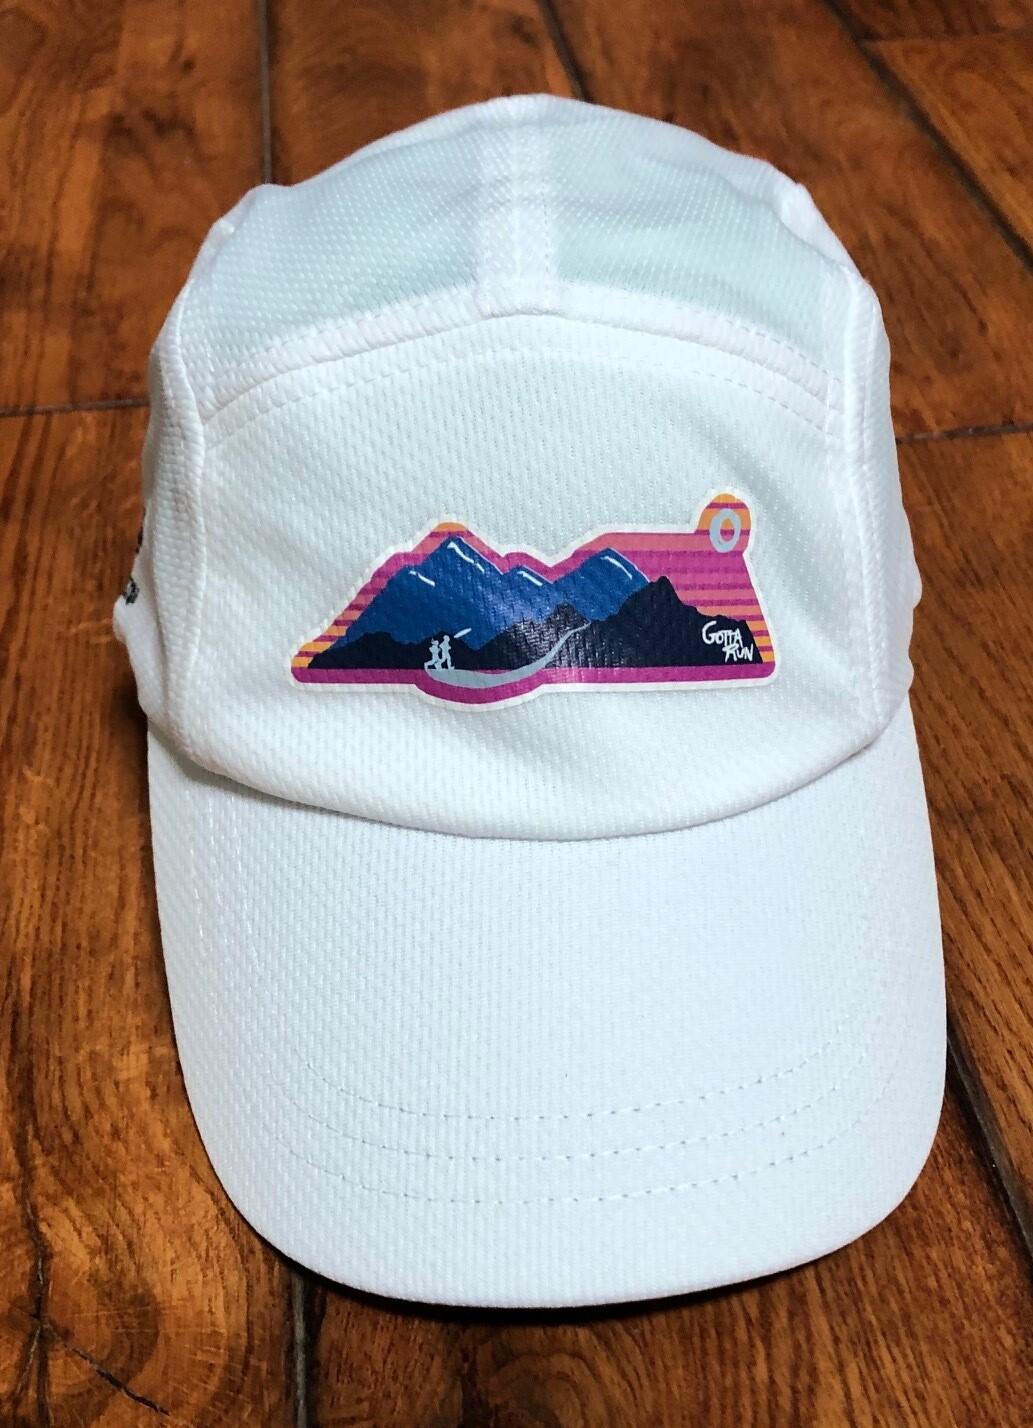 Gotta Run Lifestyle Headsweats Race Hat - White